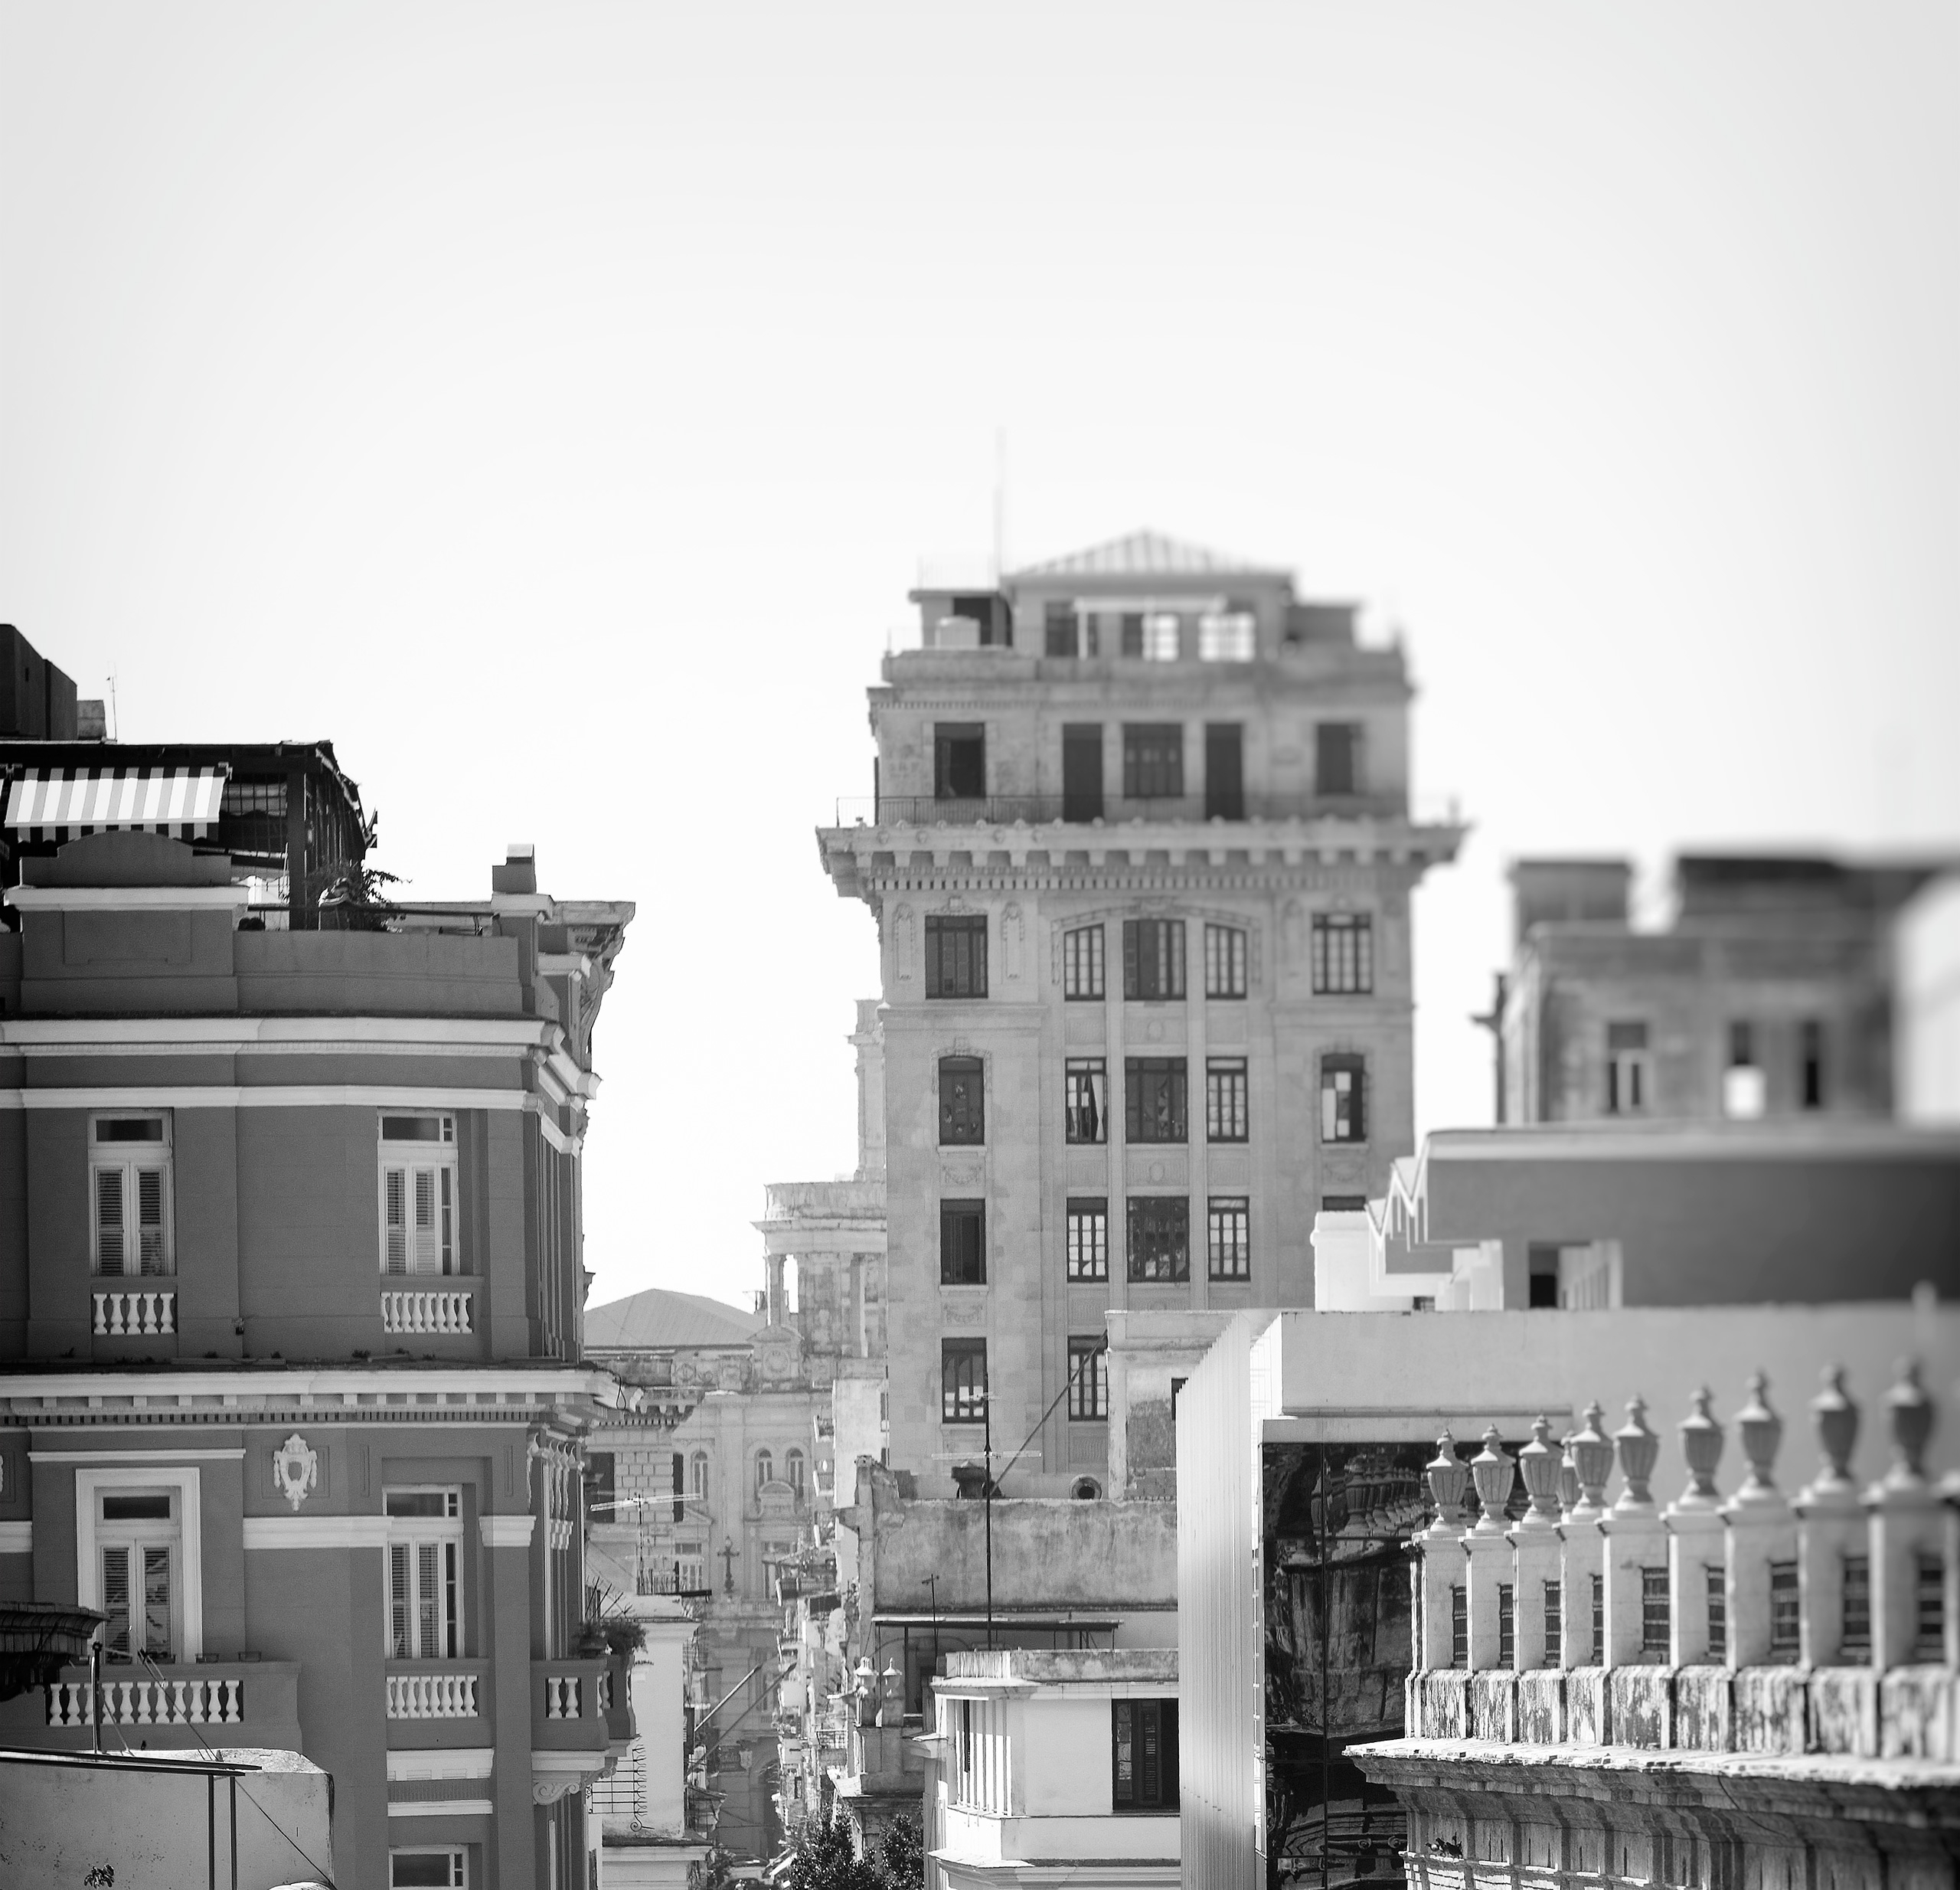 cityscape vertical - Habana, Cuba - christofkessemeier | ello